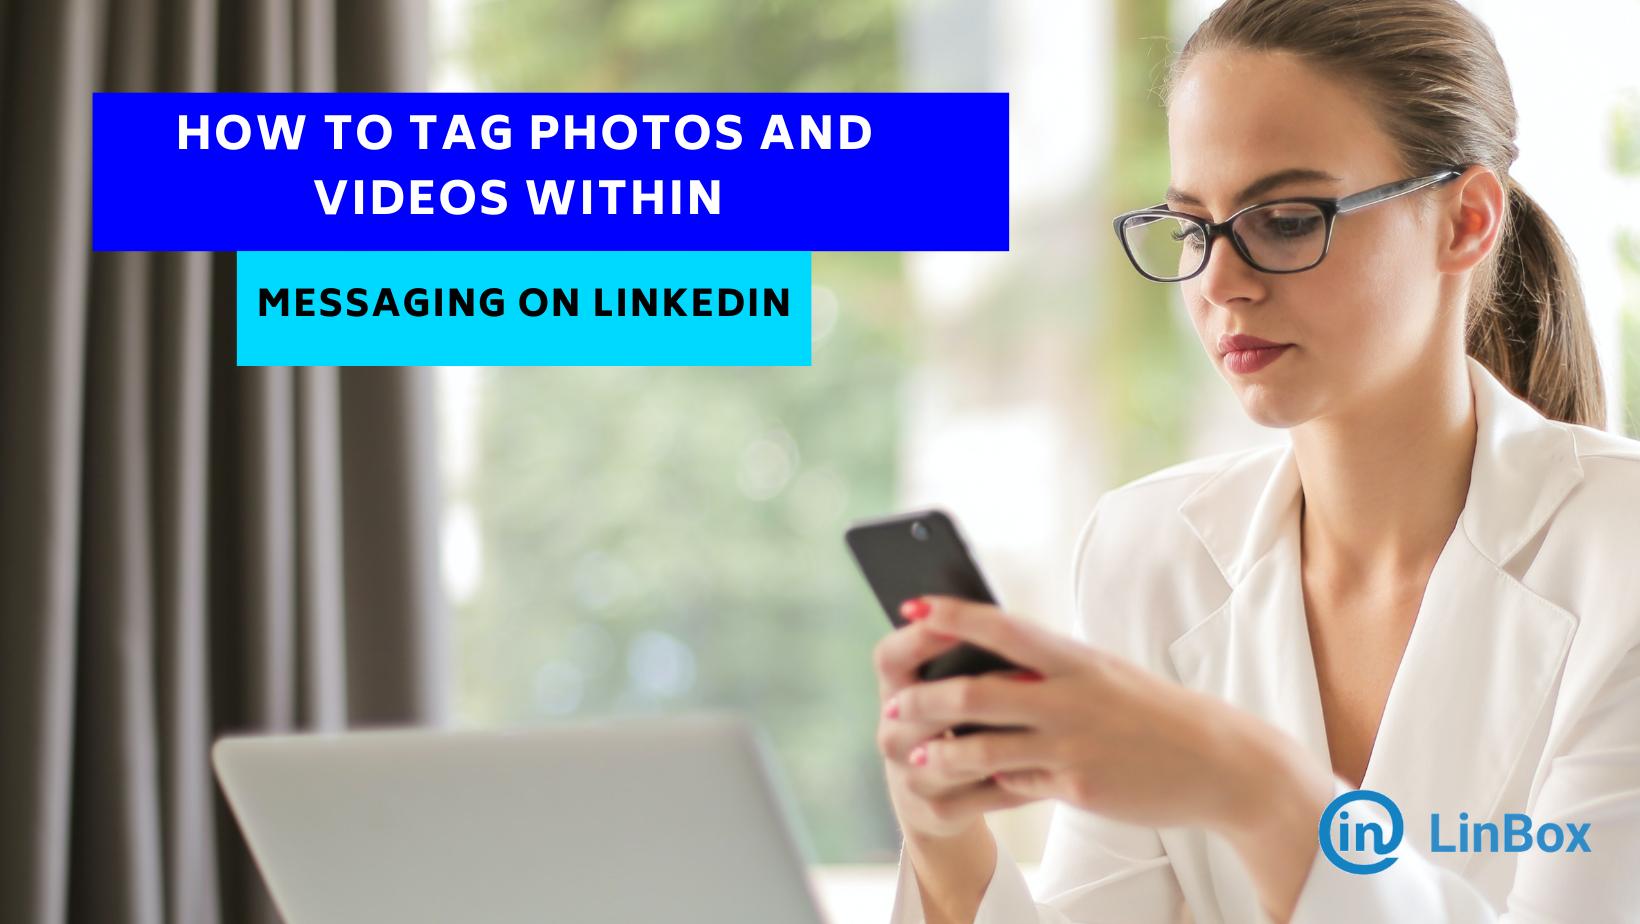 Tagging photos om Linkedin